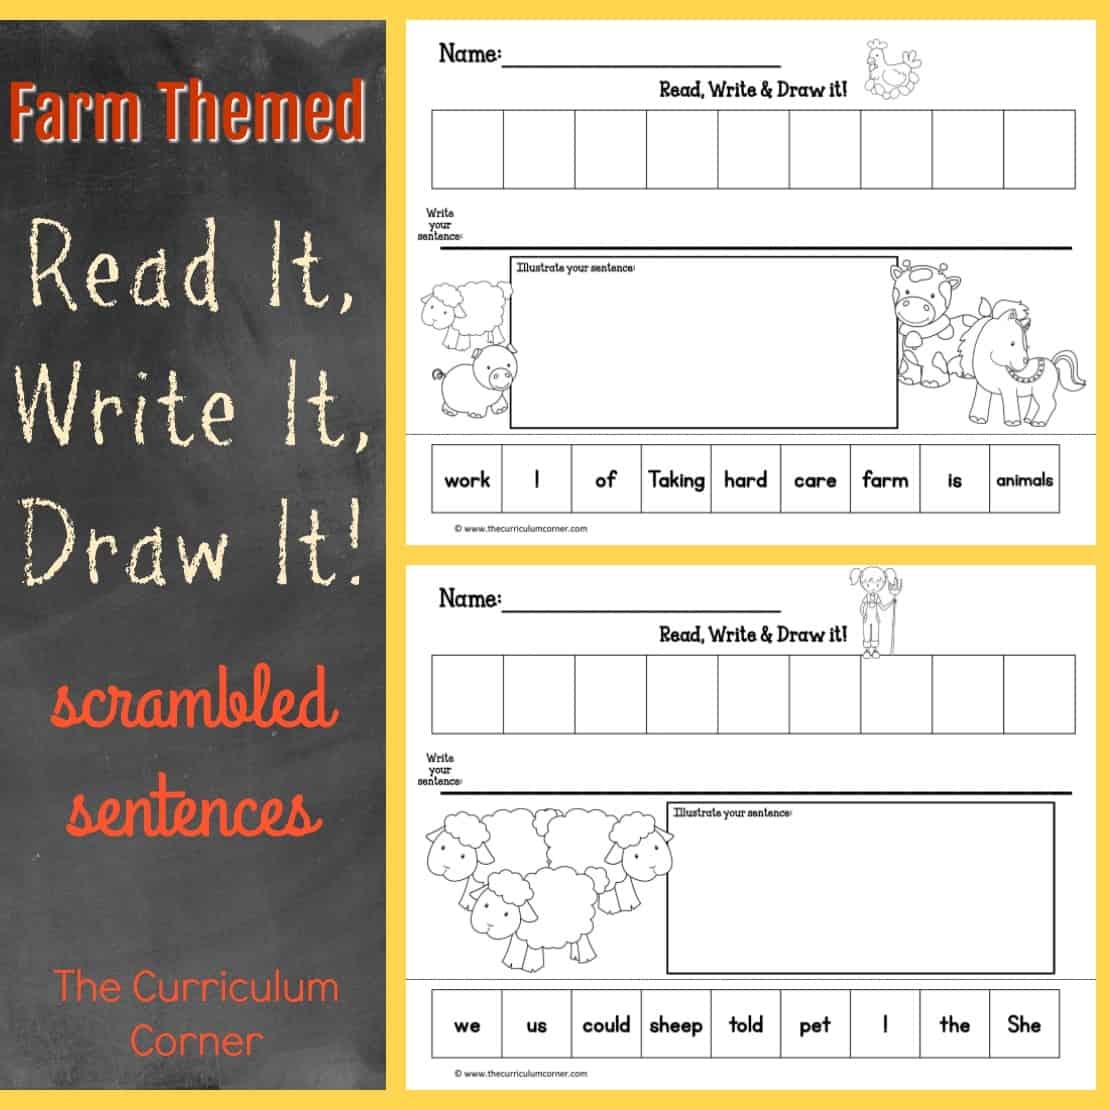 On the Farm Read, Write & Draw It!